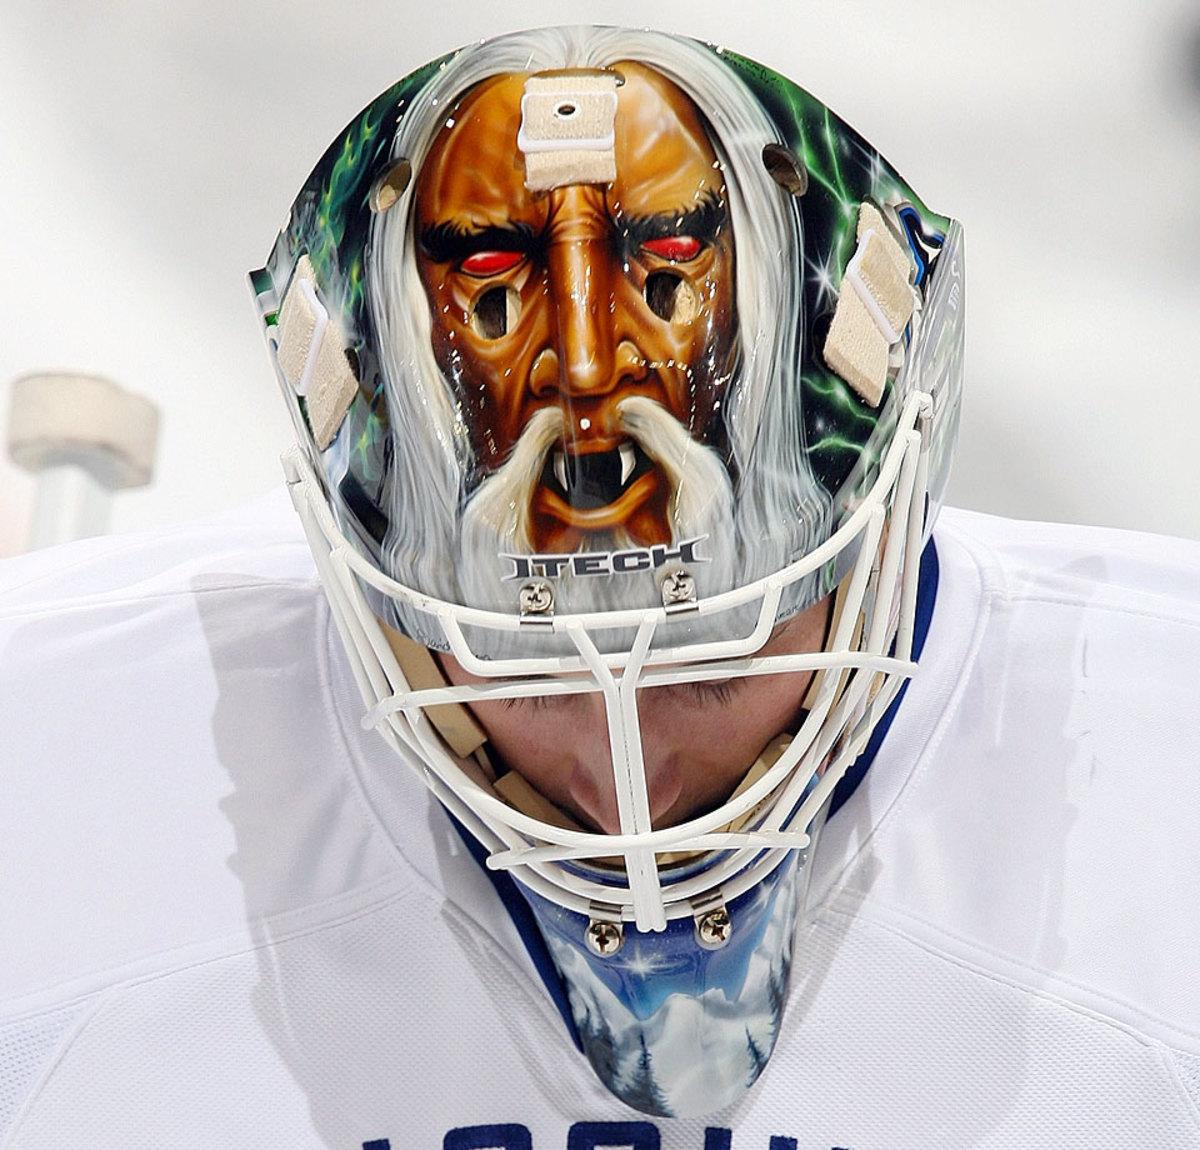 2007-08-Curtis-Sanford-goalie-mask.jpg